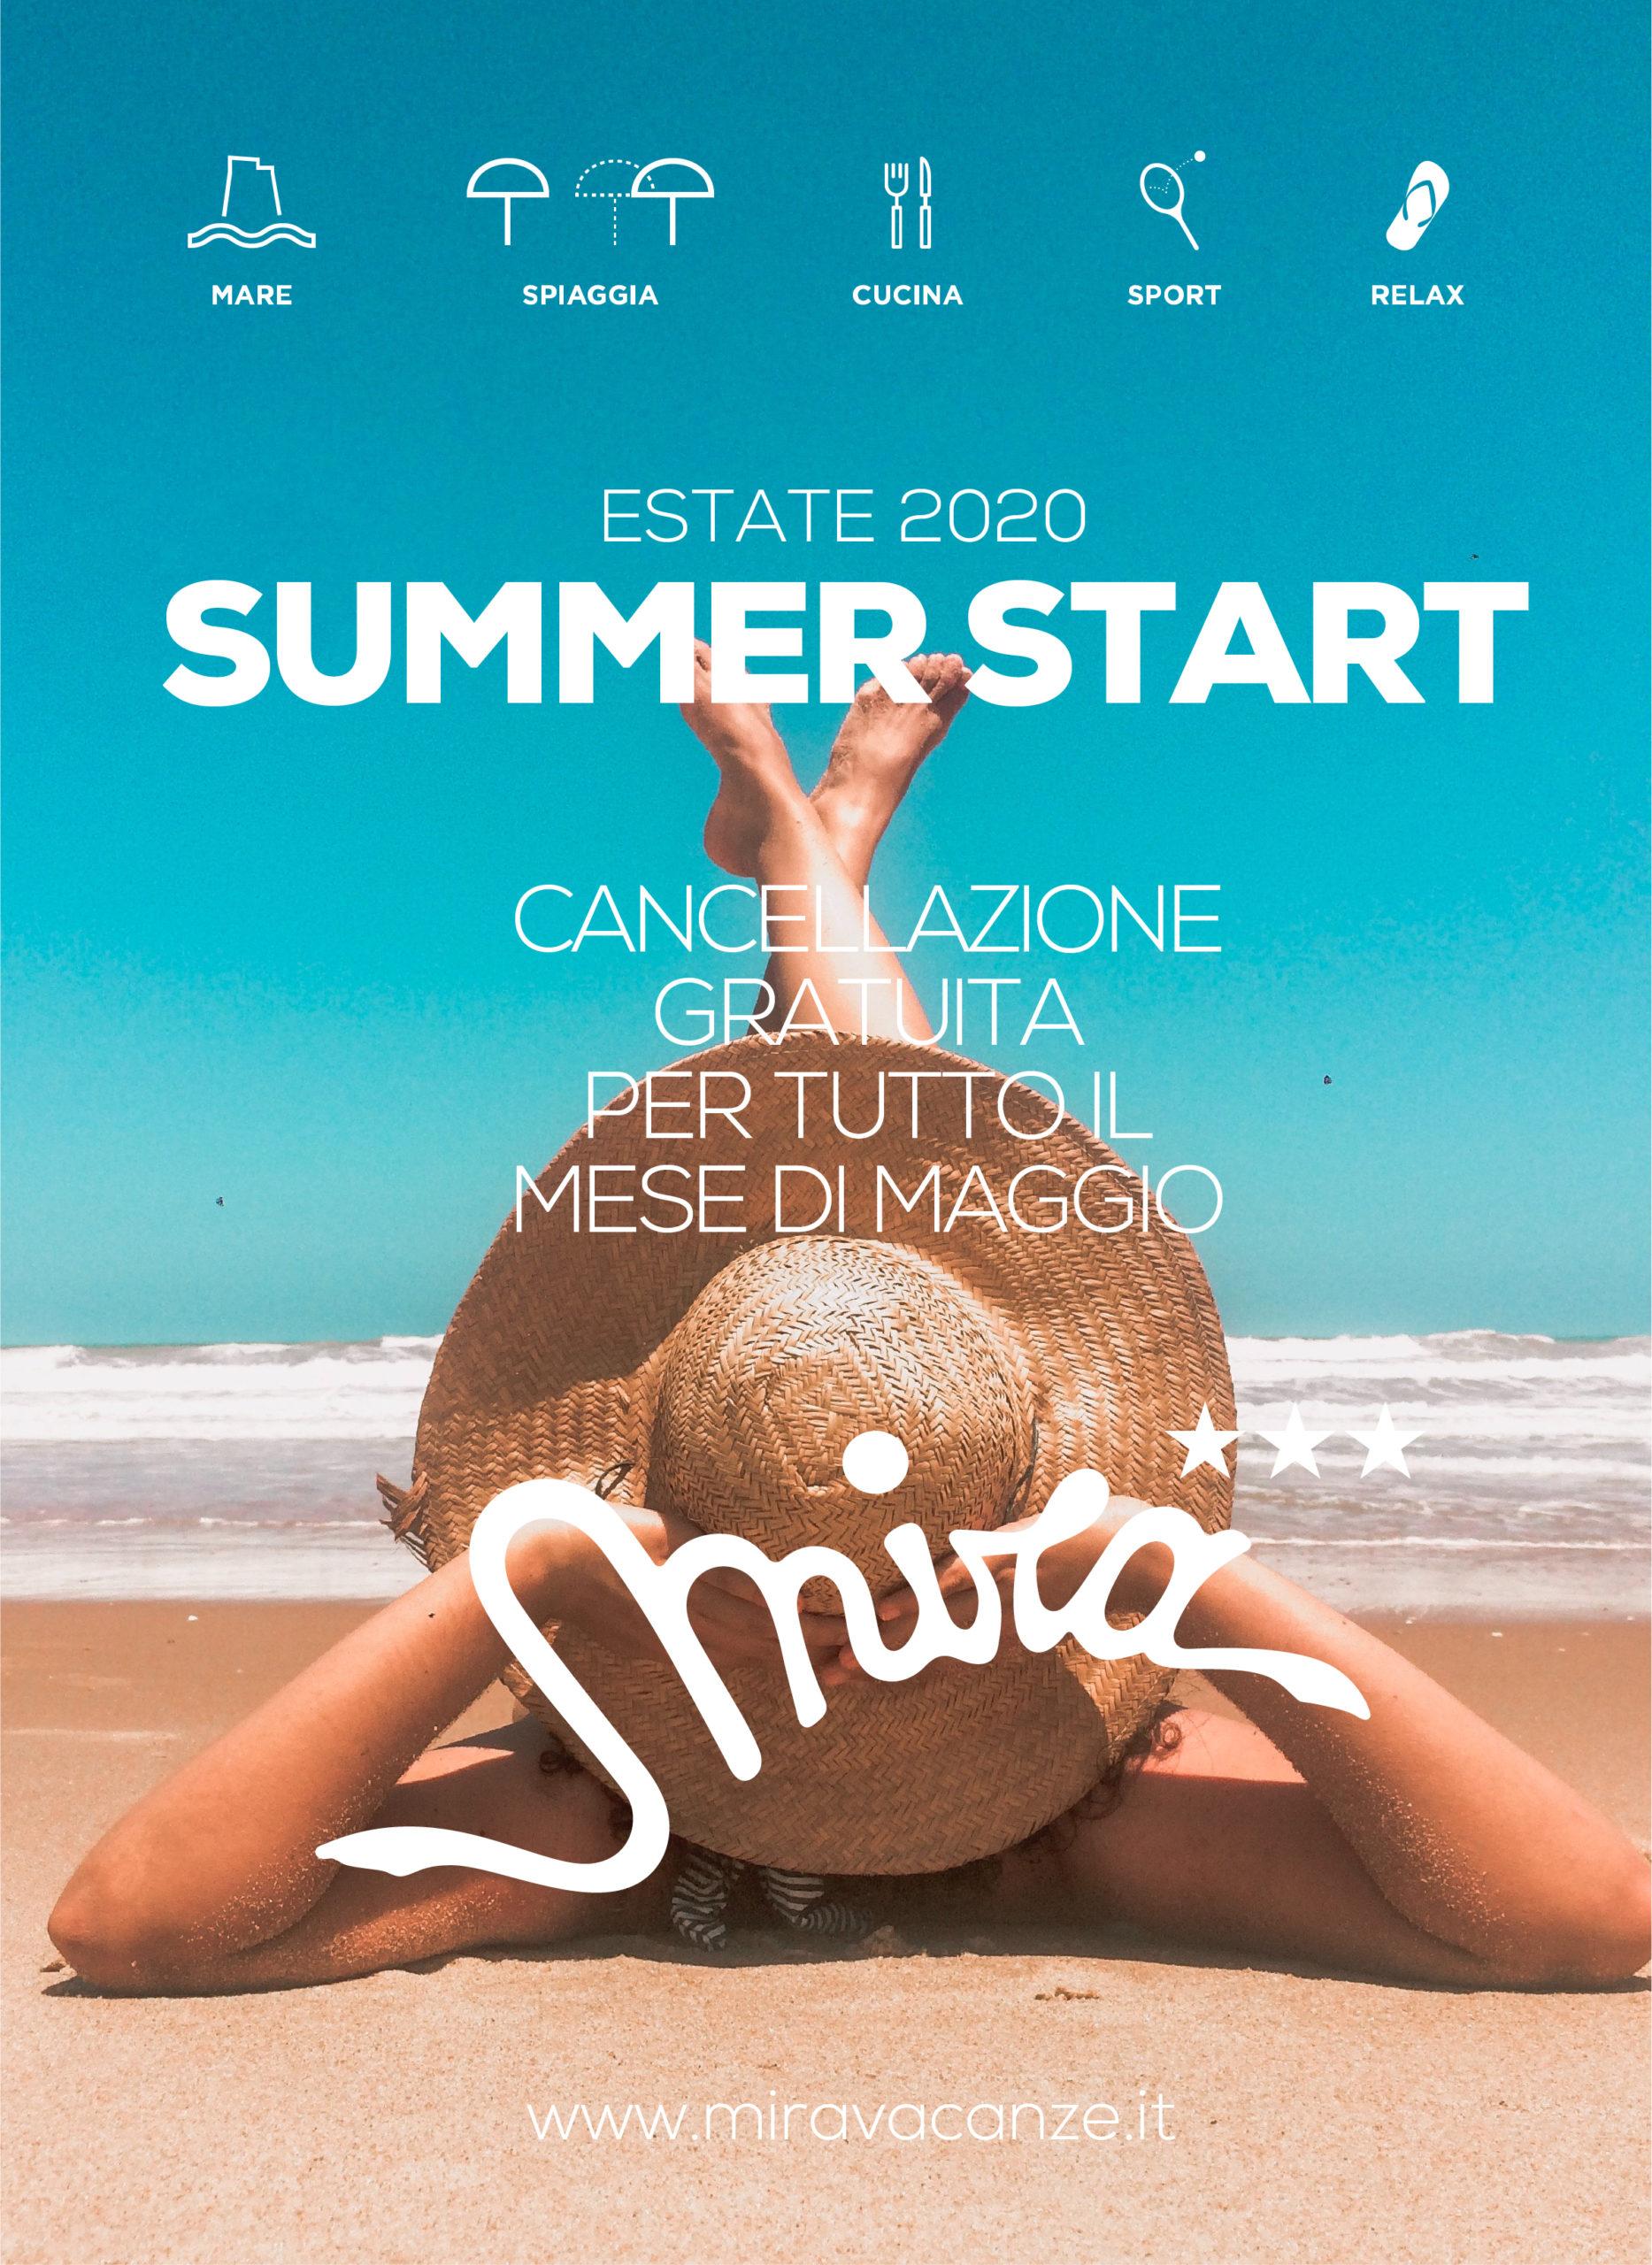 summer-start-ad-001-08